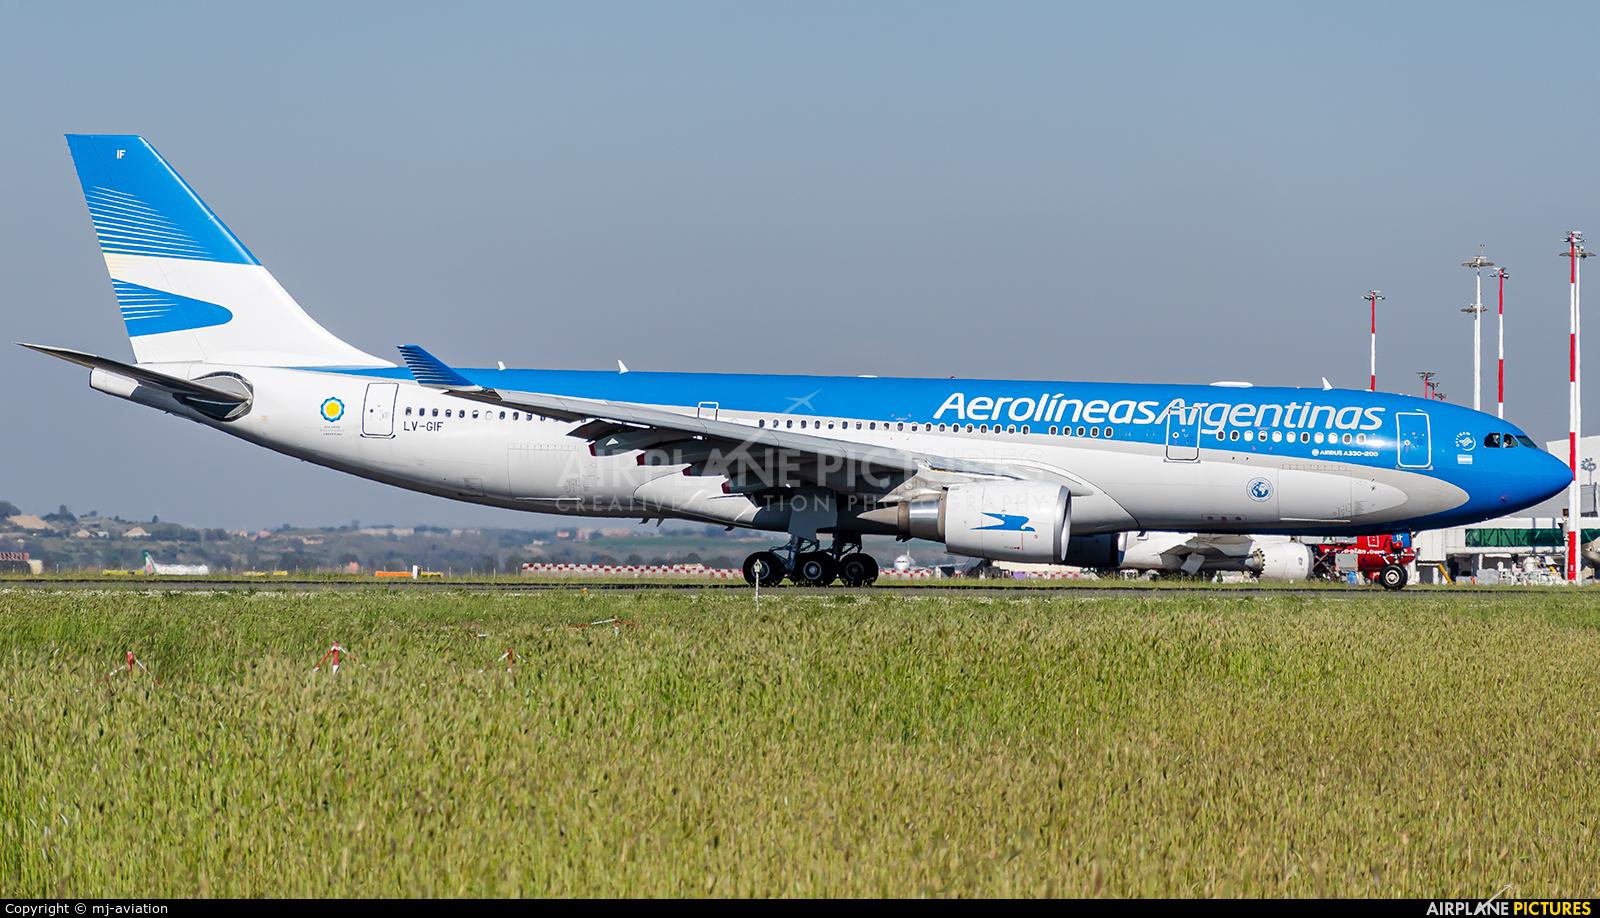 Aerolineas Argentinas LV-GIF aircraft at Rome - Fiumicino